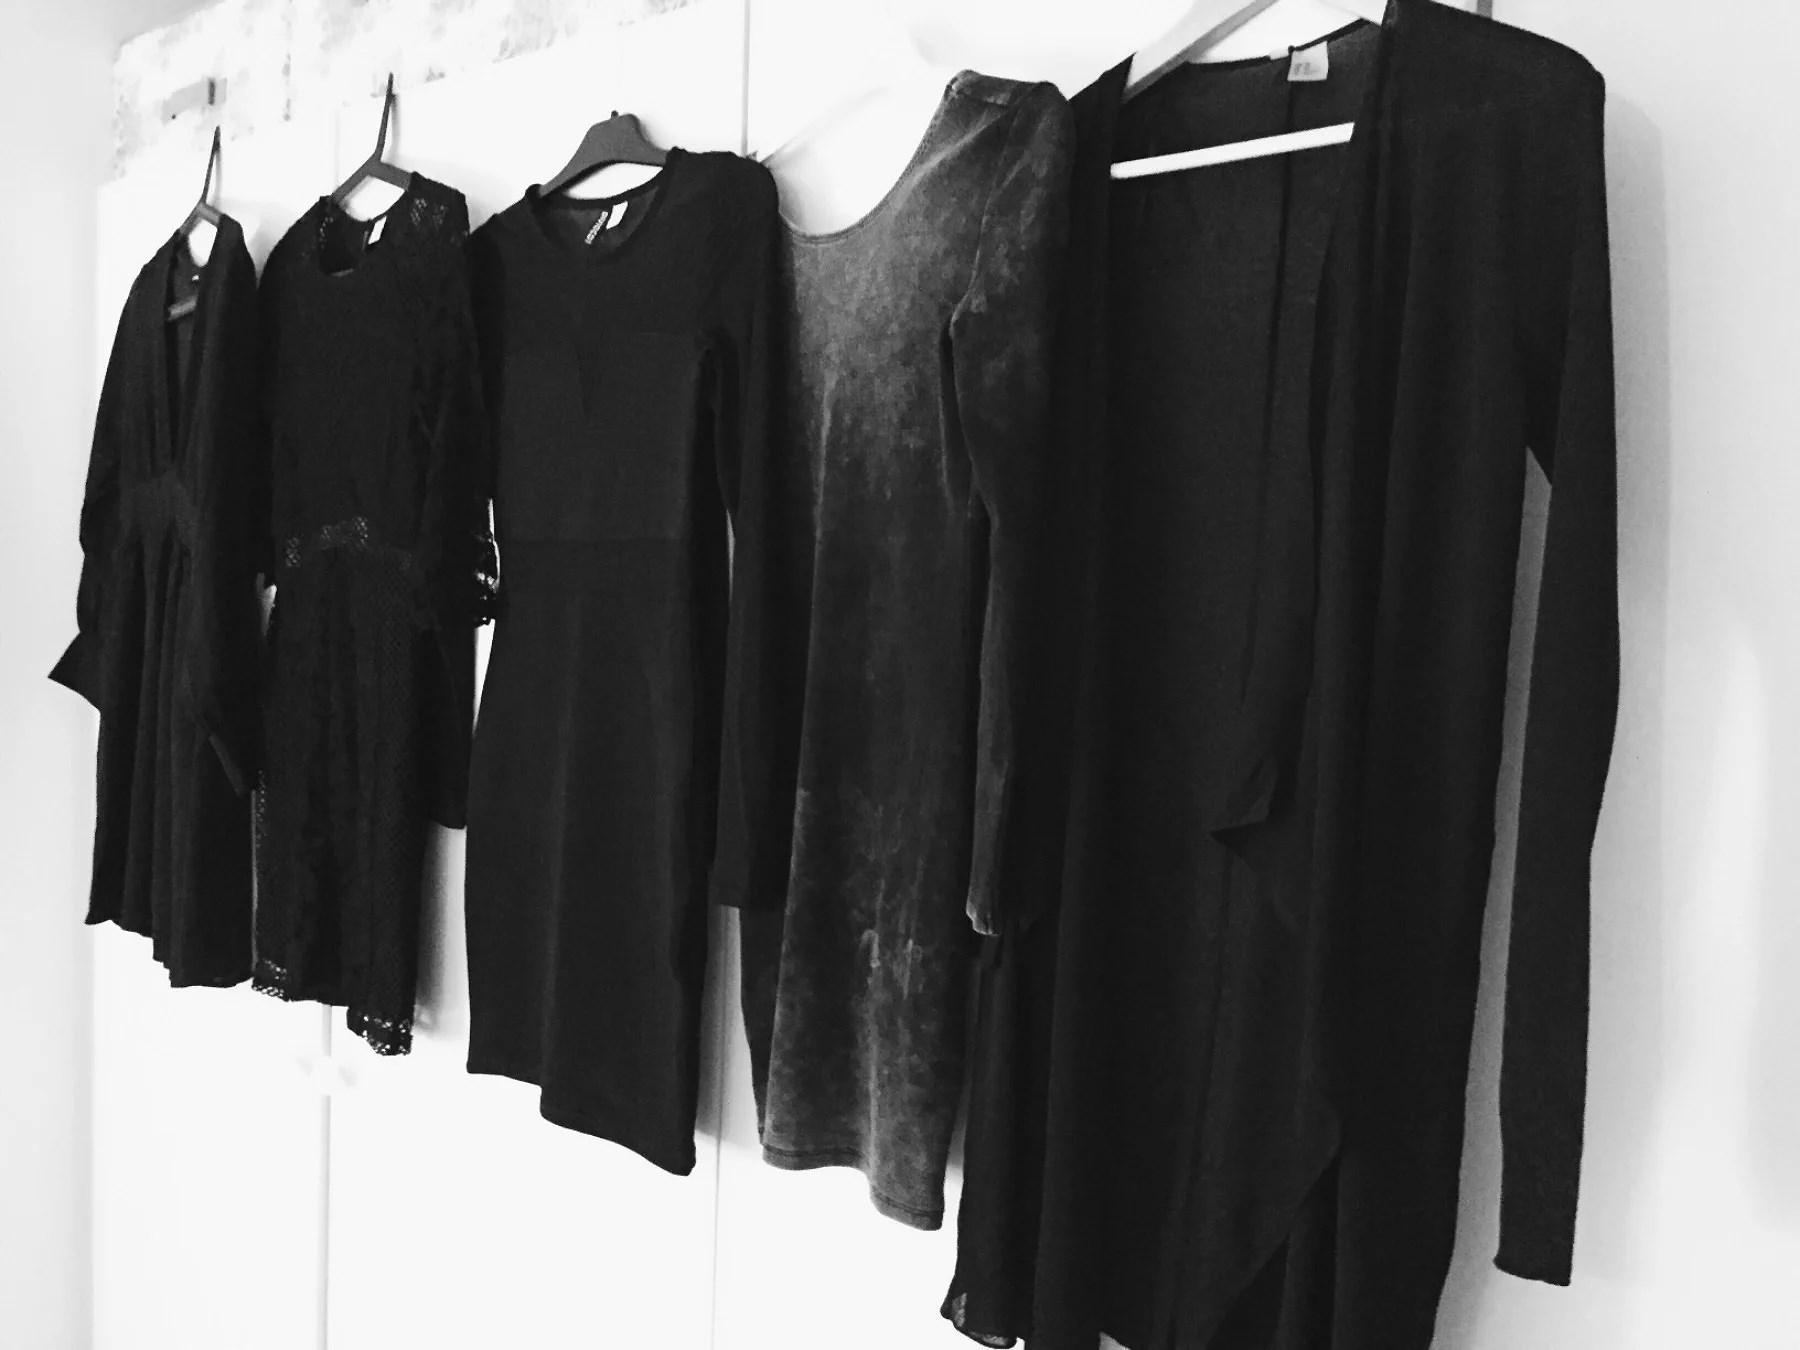 50 shades of black dresses...